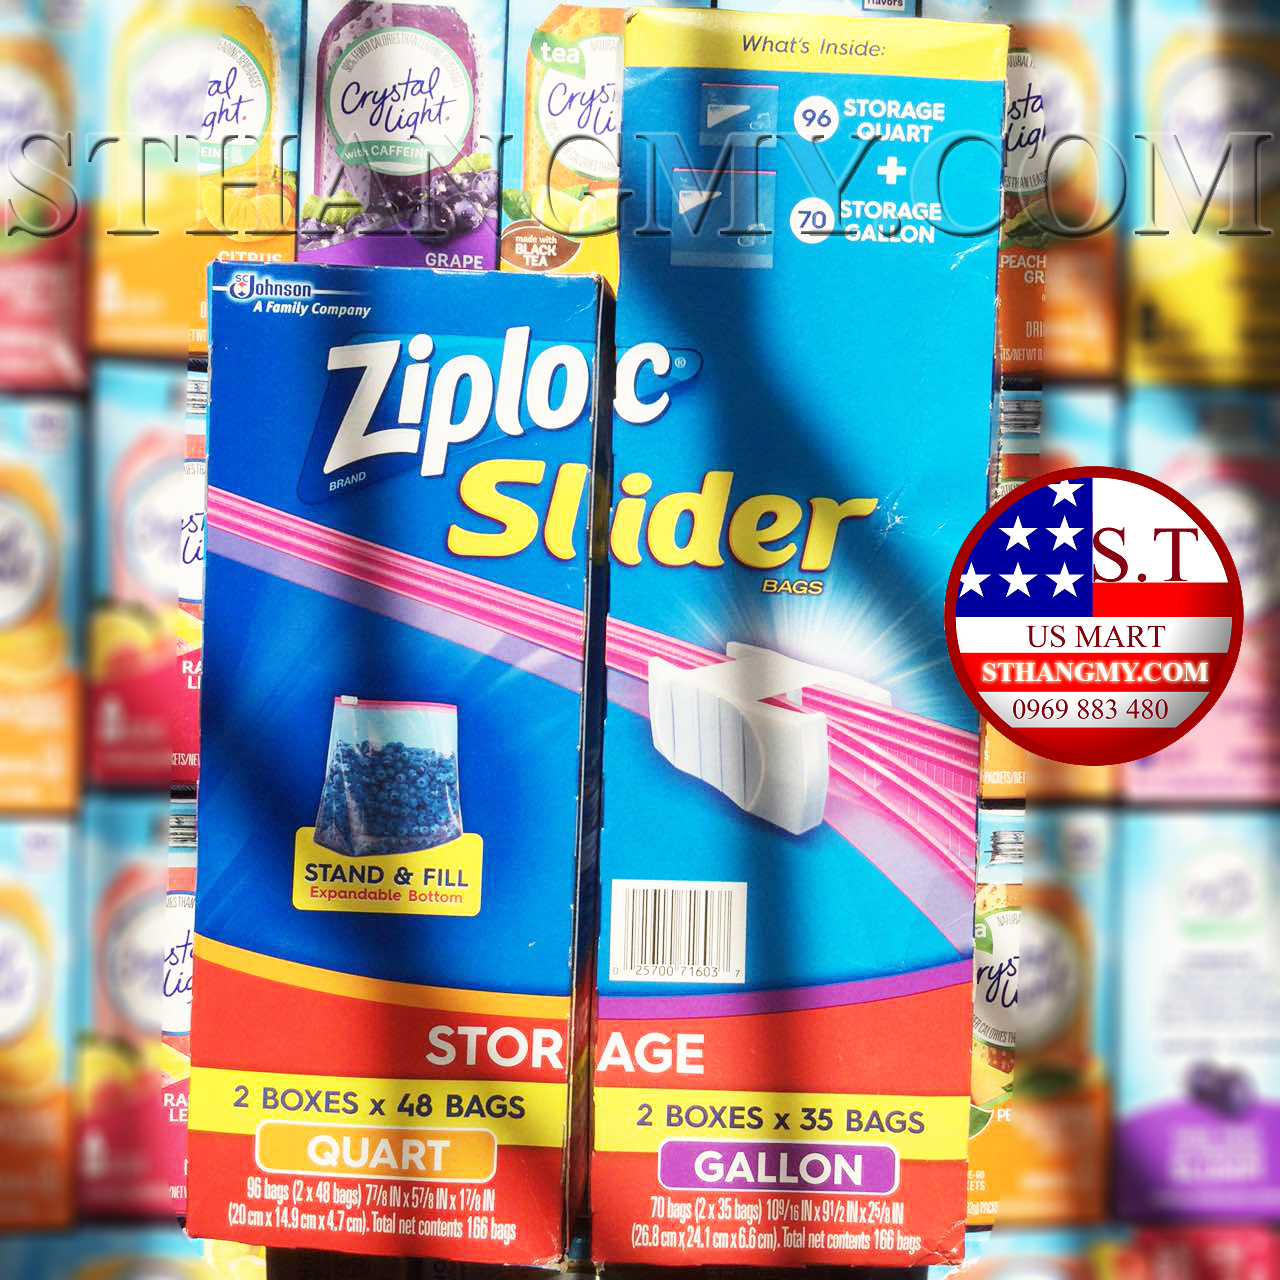 Hộp 35 Túi Zip có khóa kéo size lớn- Ziploc Slider Storeage Bags Gallon